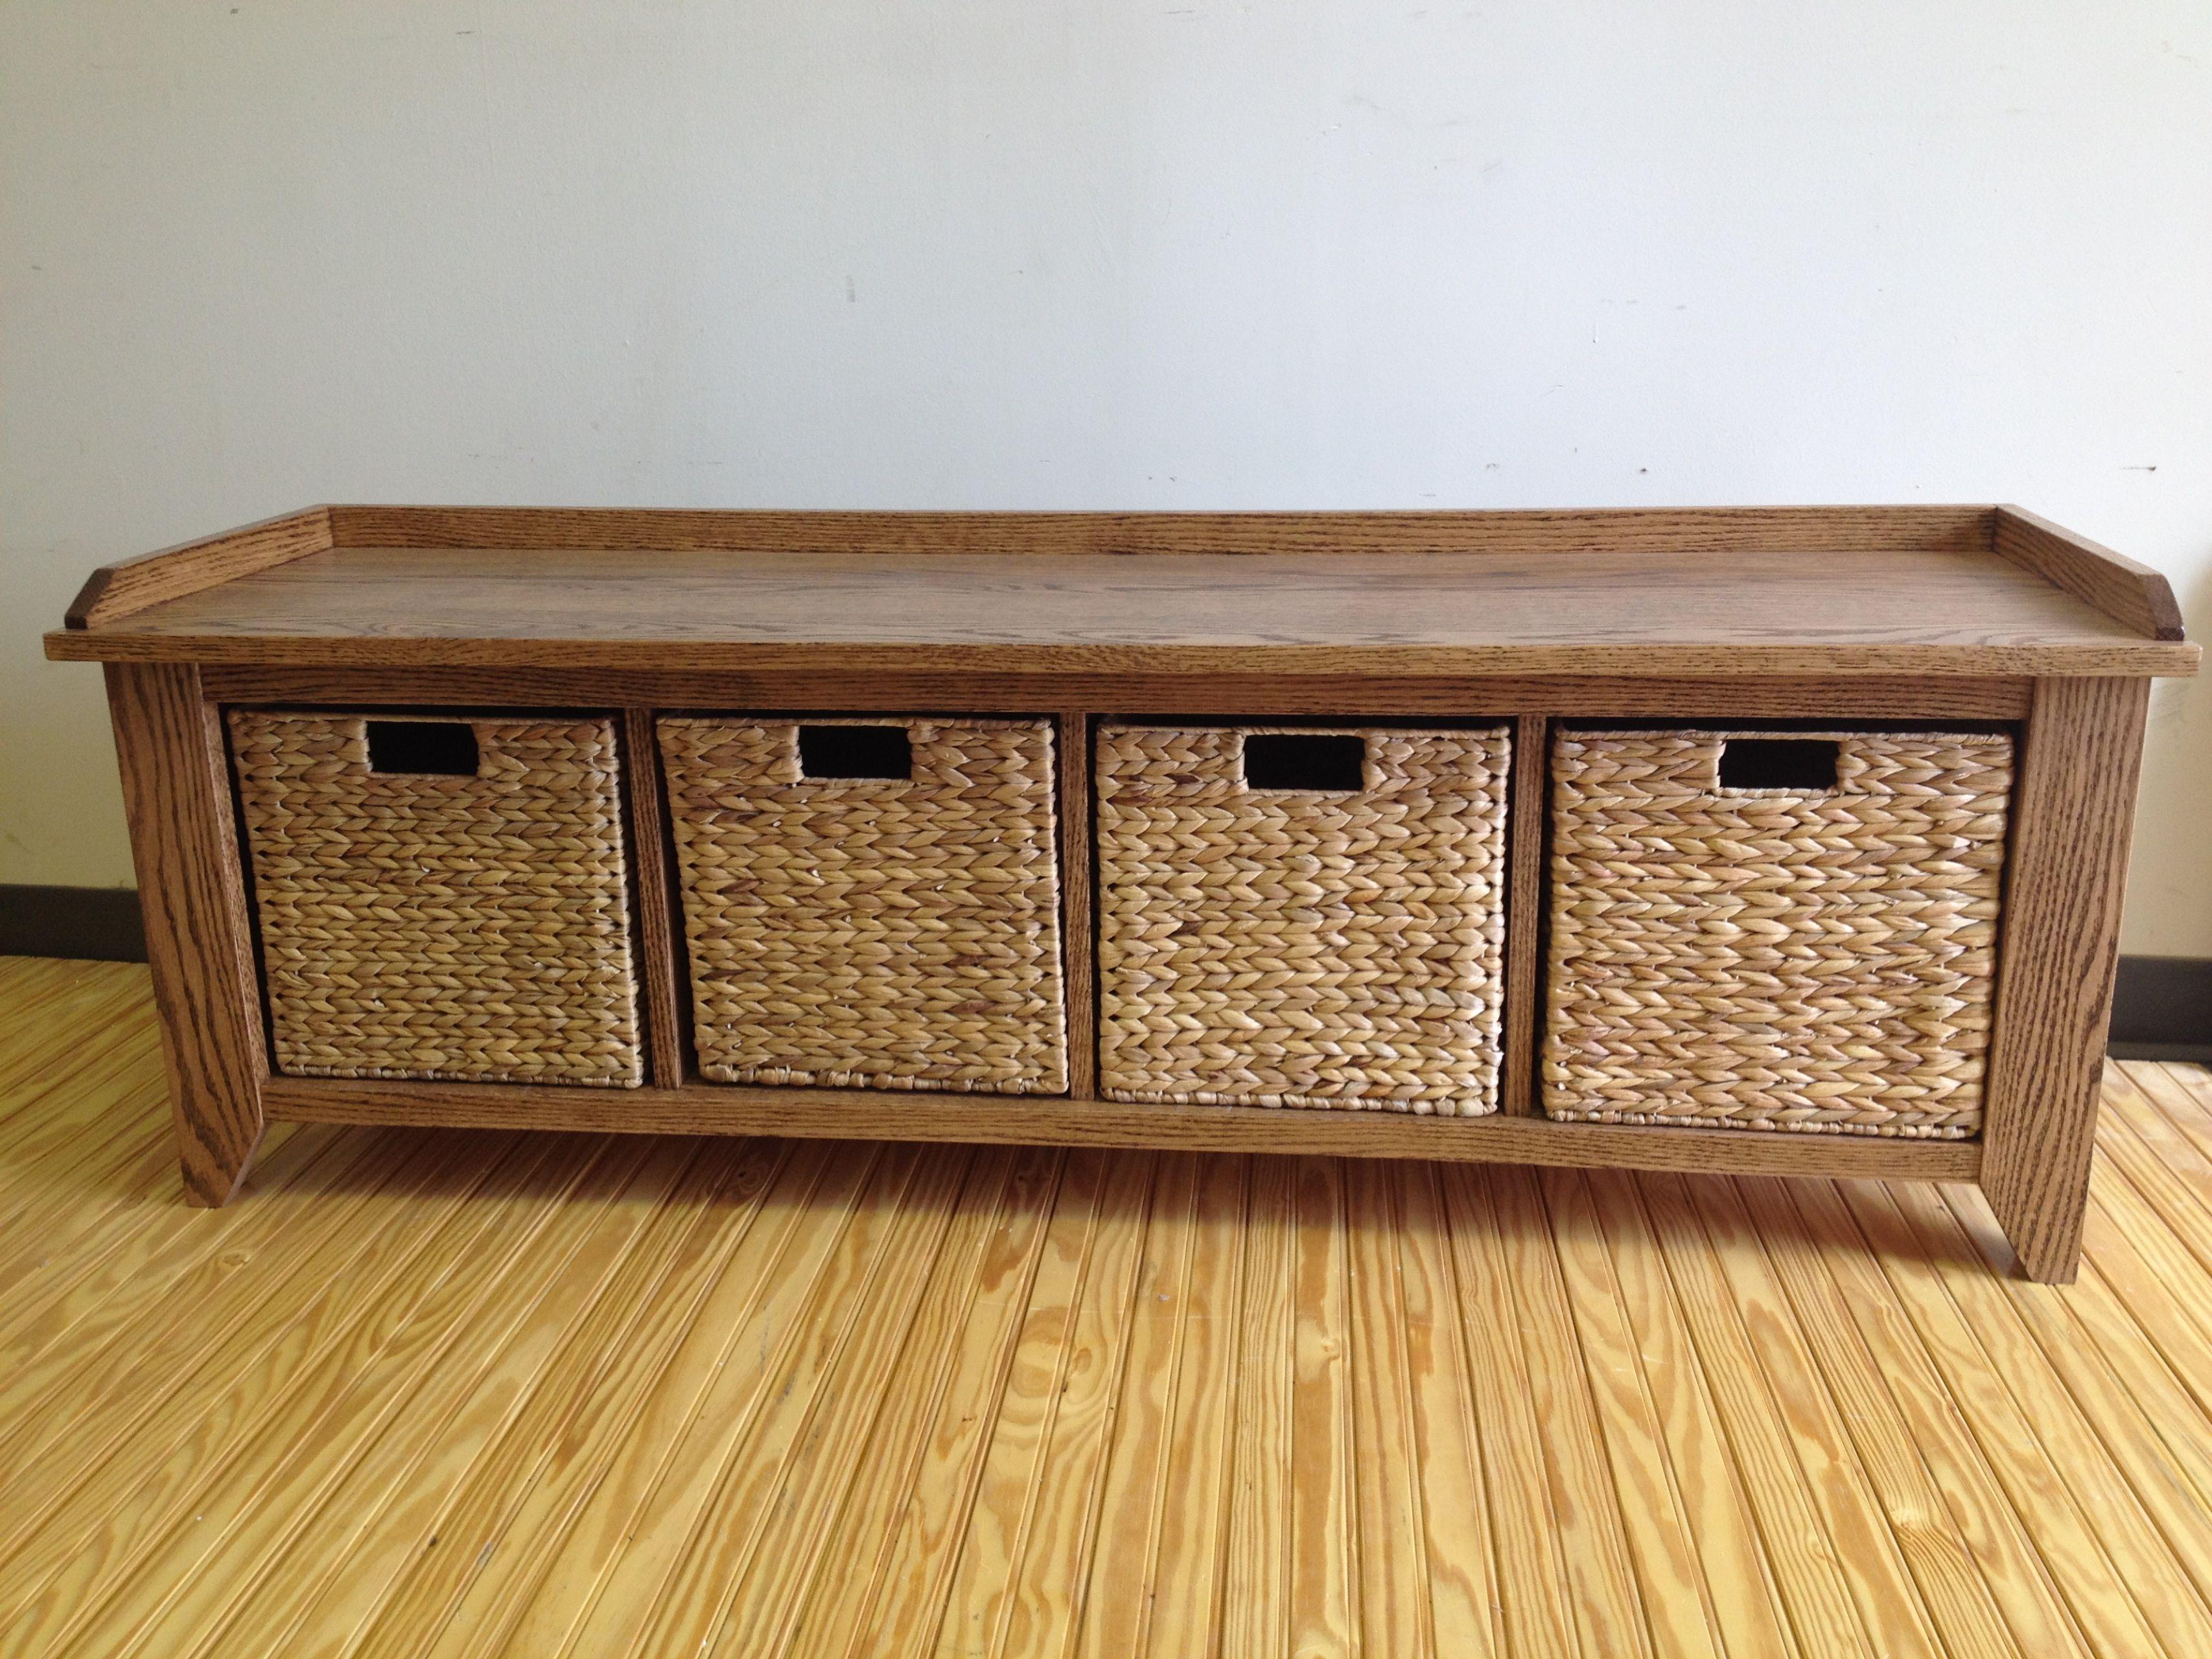 Stupendous Oak Storage Bench With Large Basket Cubbies Wood Storage Ibusinesslaw Wood Chair Design Ideas Ibusinesslaworg